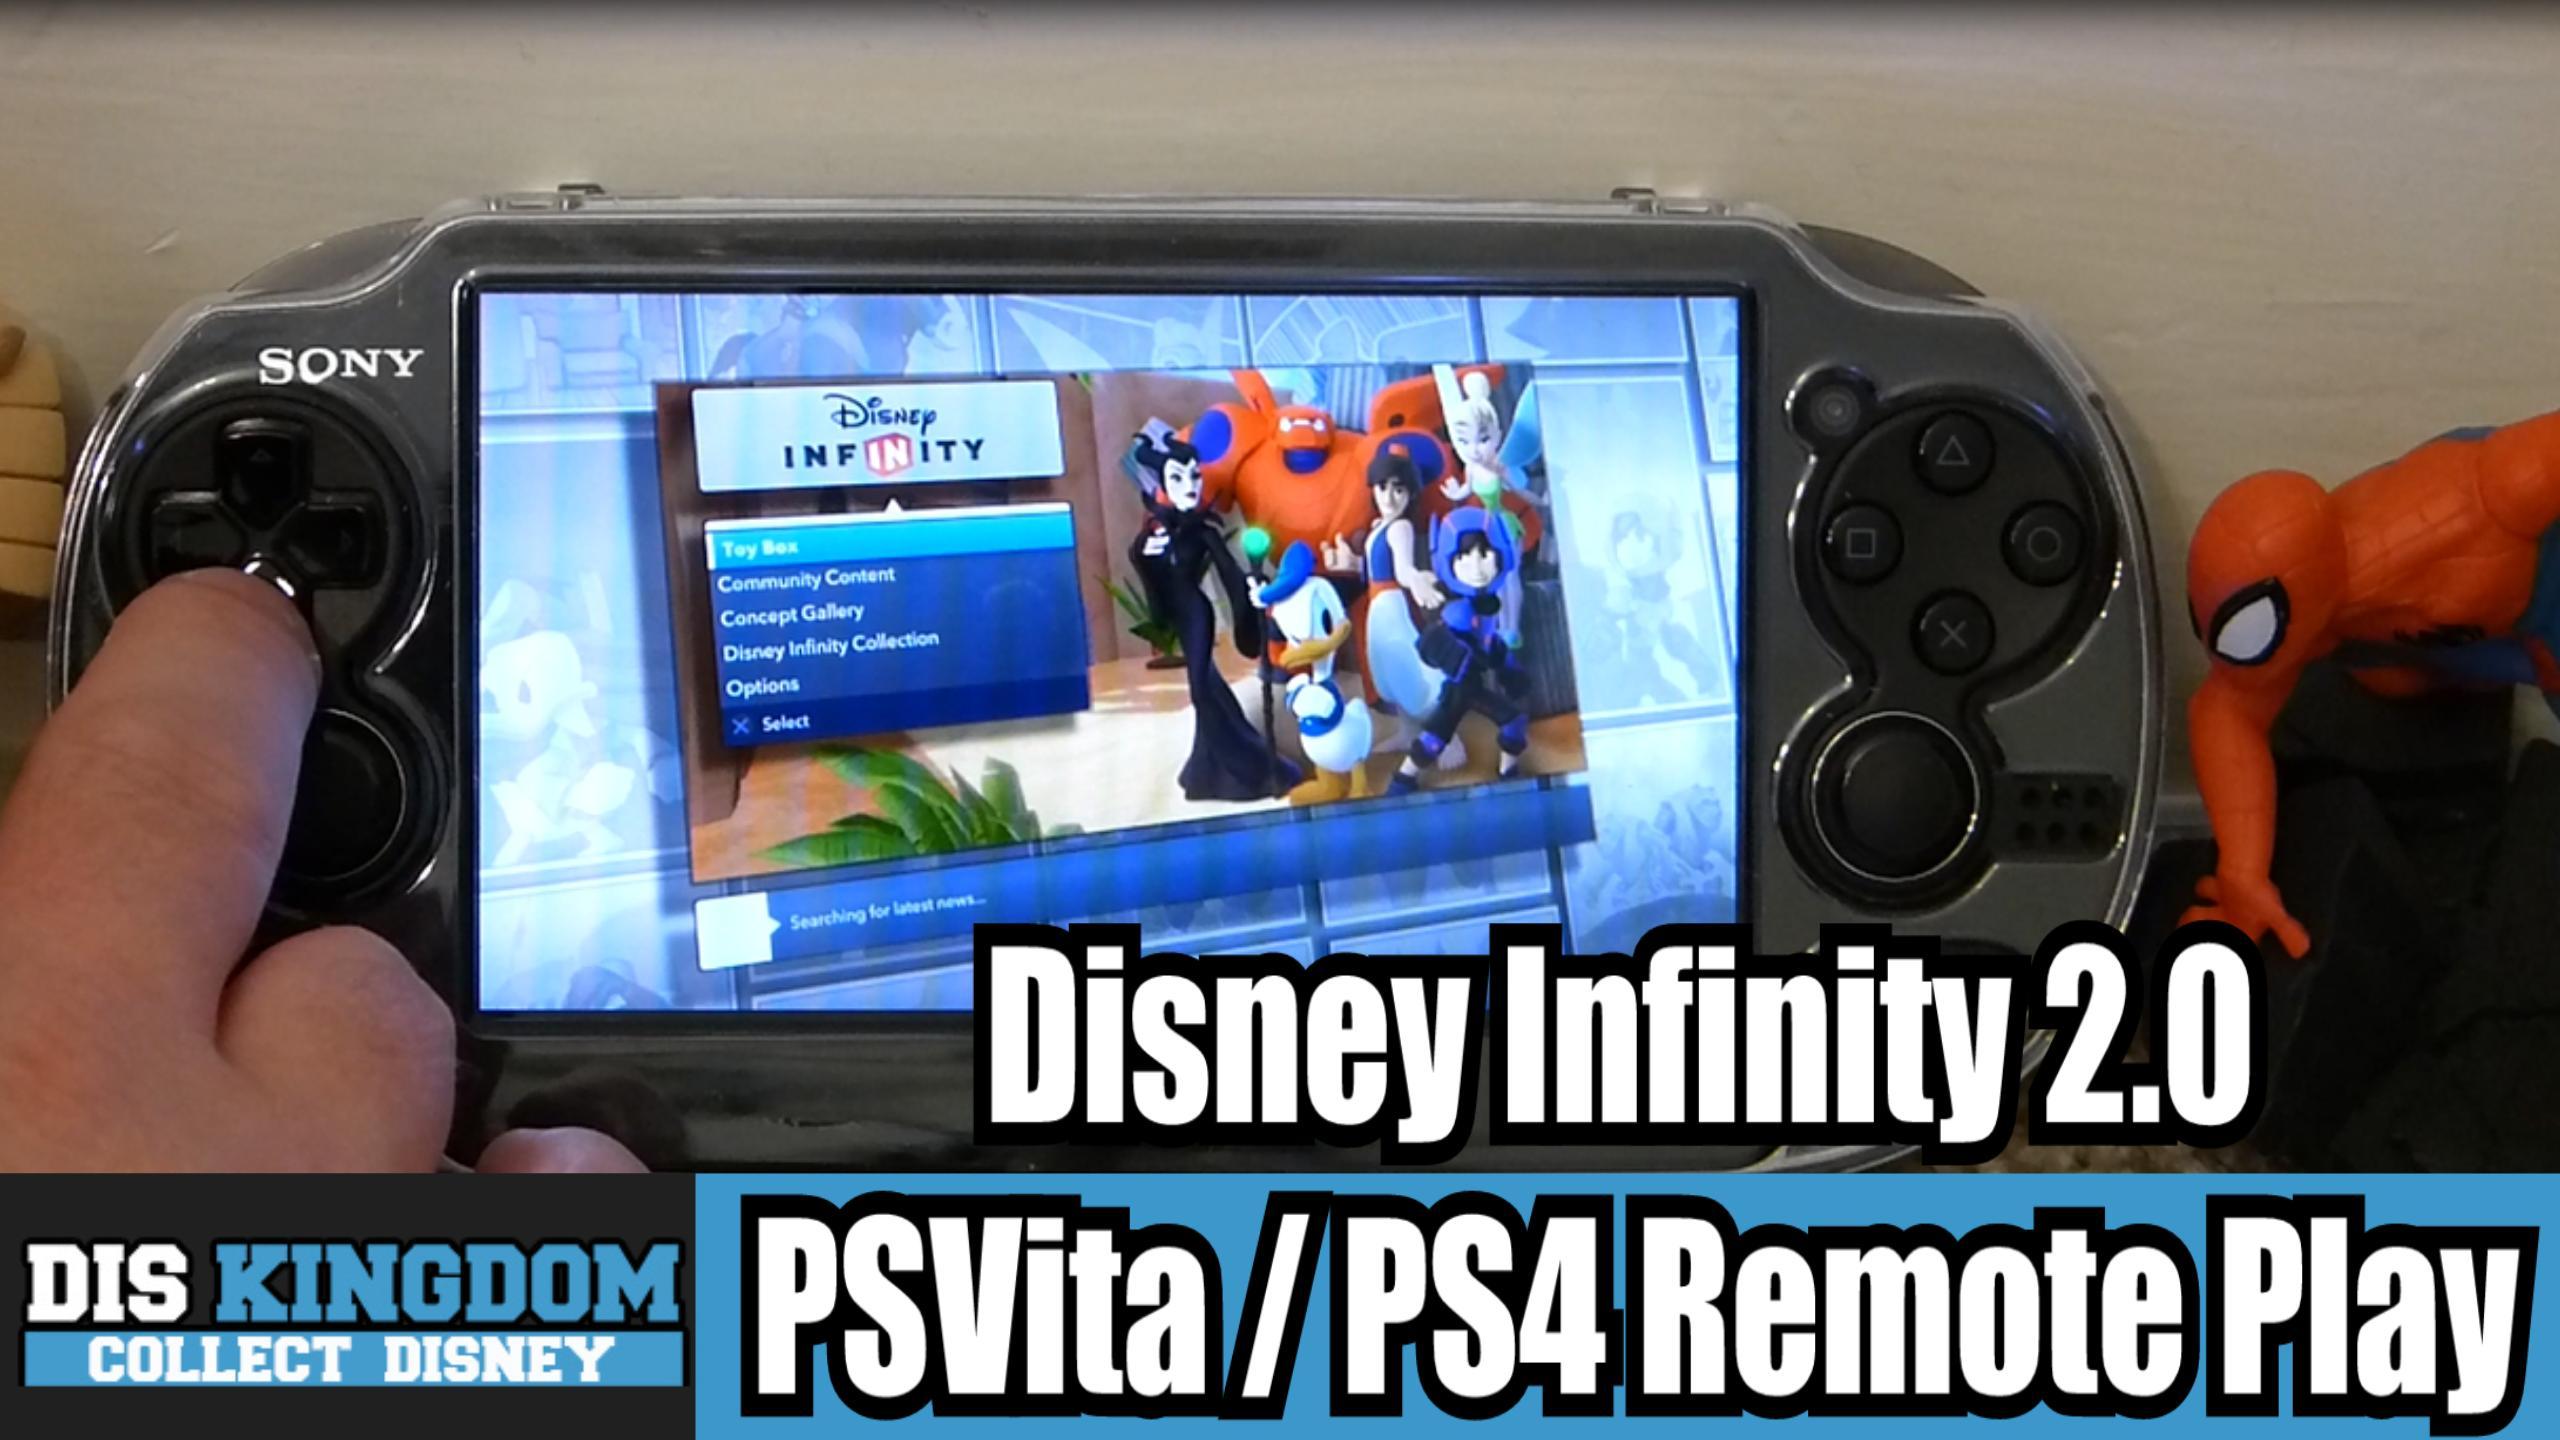 Disney Infinity 2 0 Ps Vita Ps4 Remote Play Details Diskingdom Com Disney Marvel Star Wars Video Game News